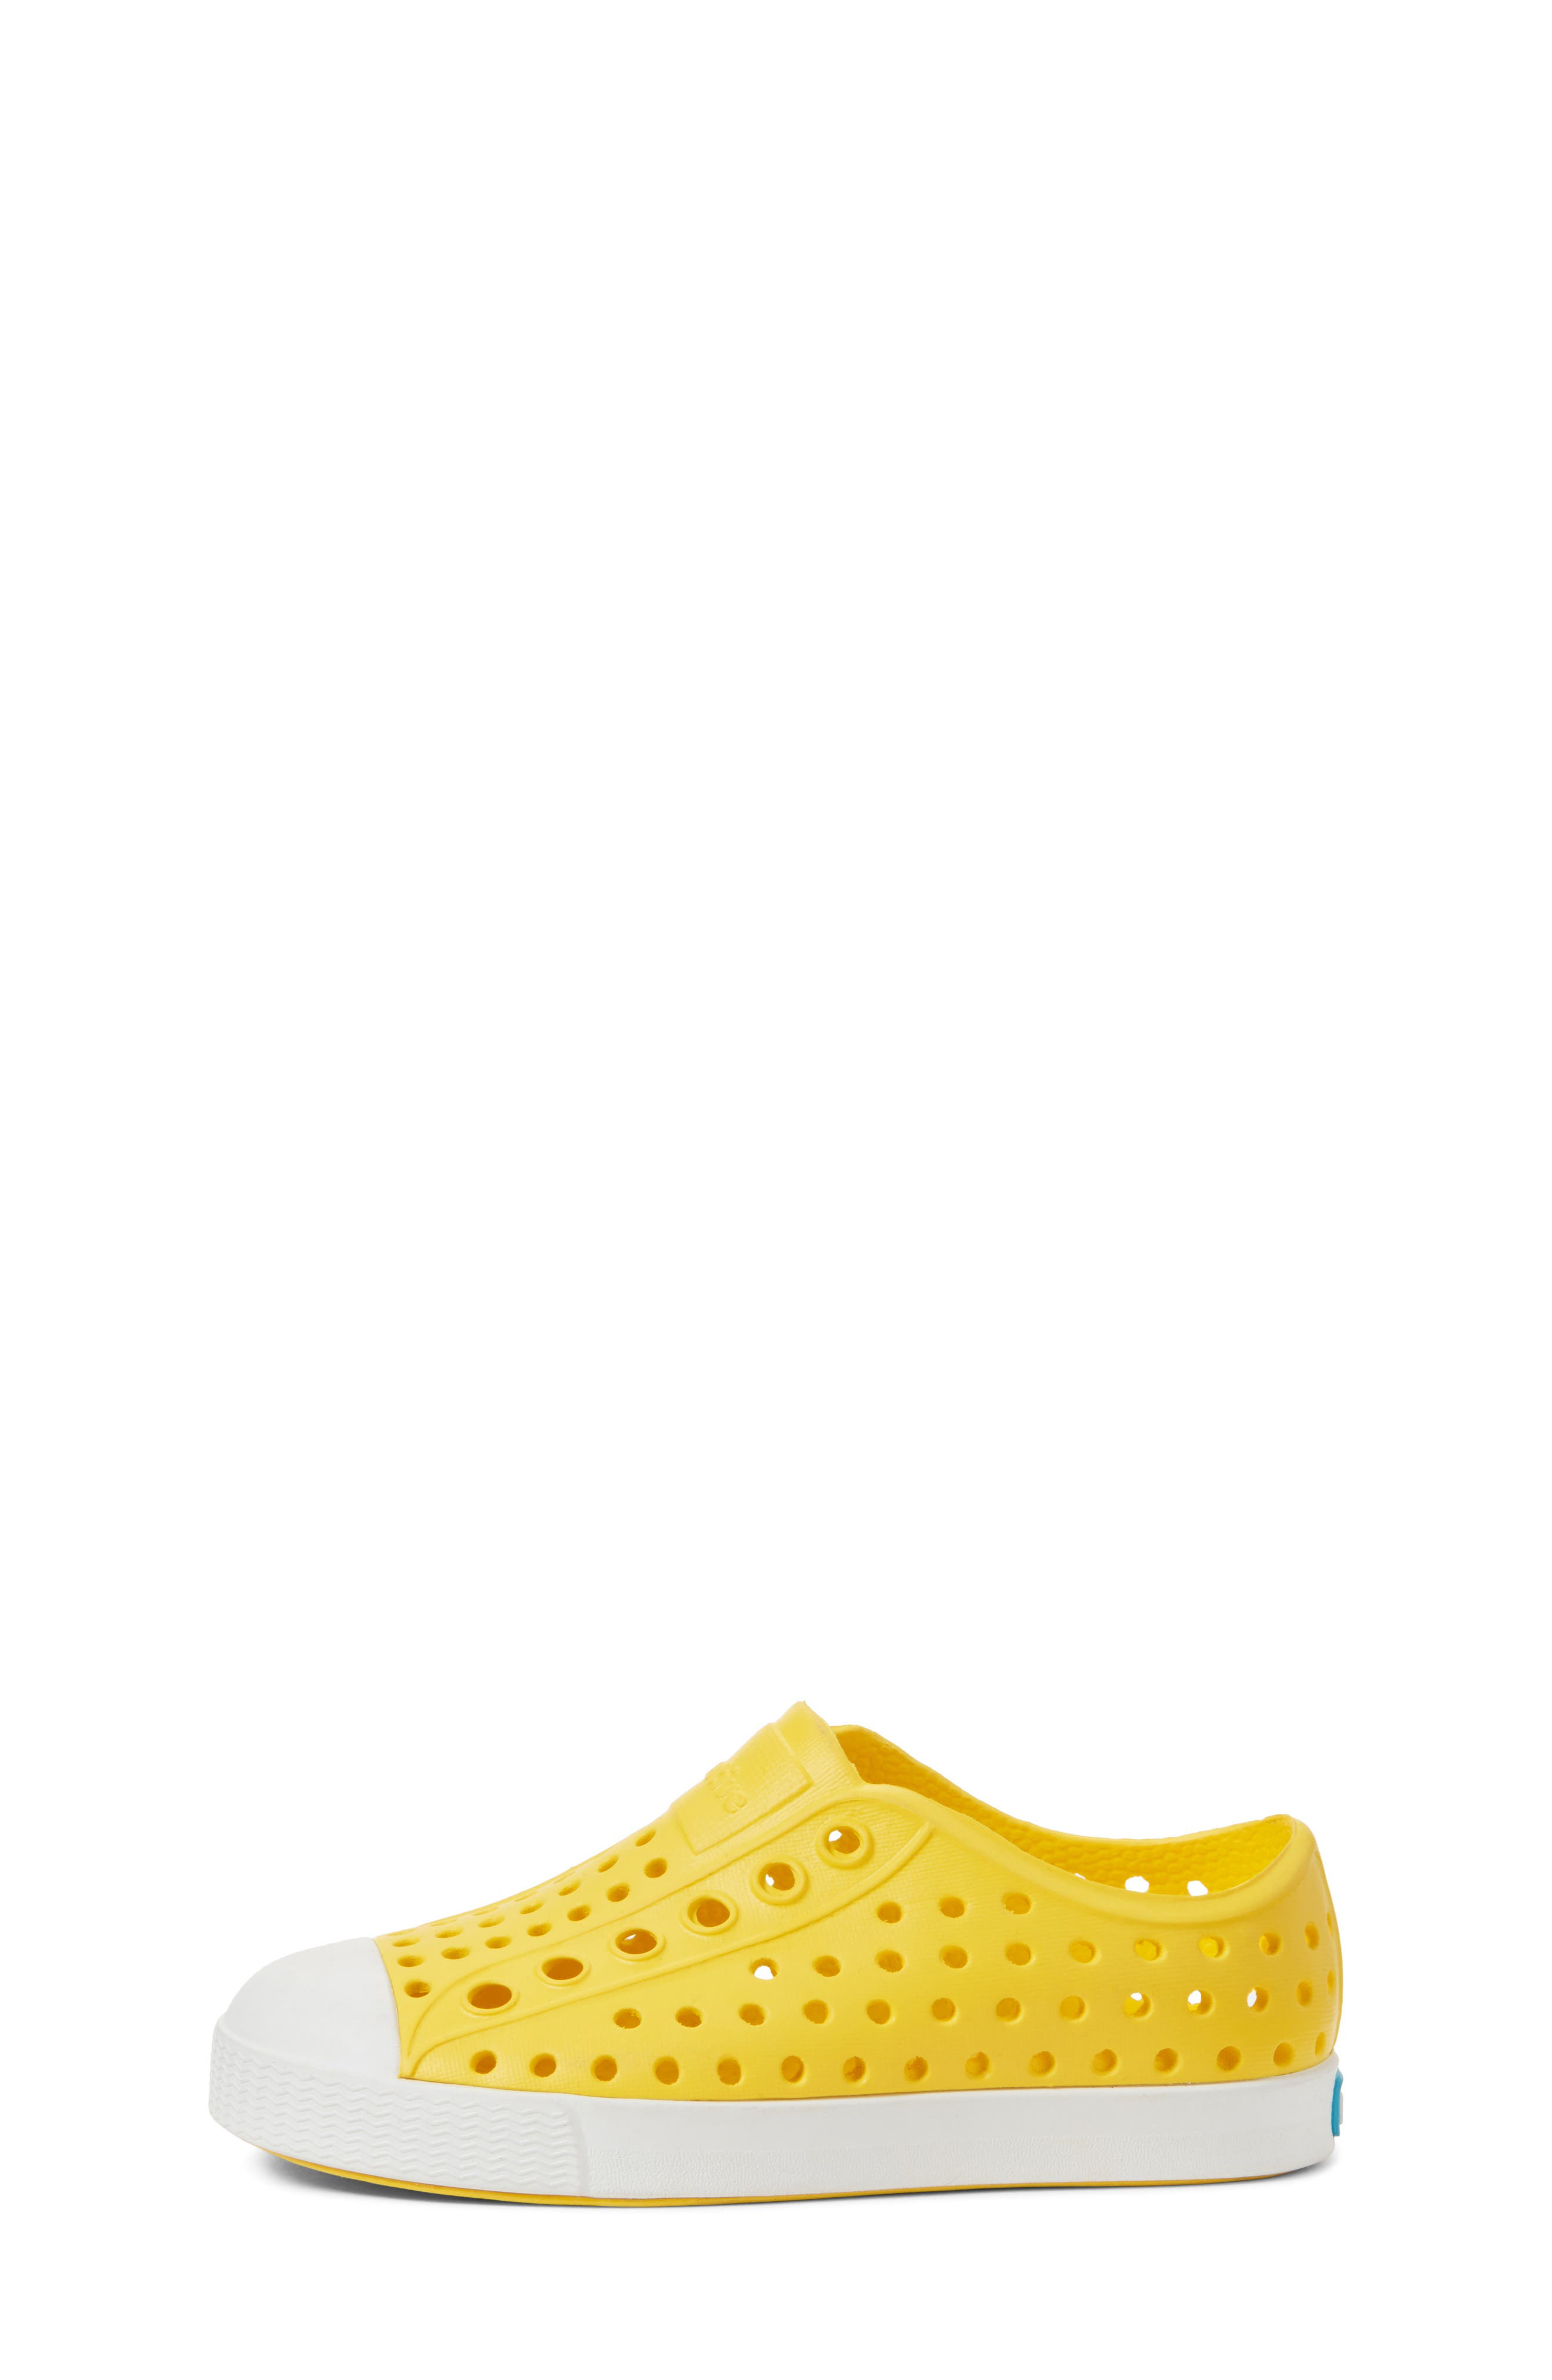 'Jefferson' Water Friendly Slip-On Sneaker,                             Alternate thumbnail 133, color,